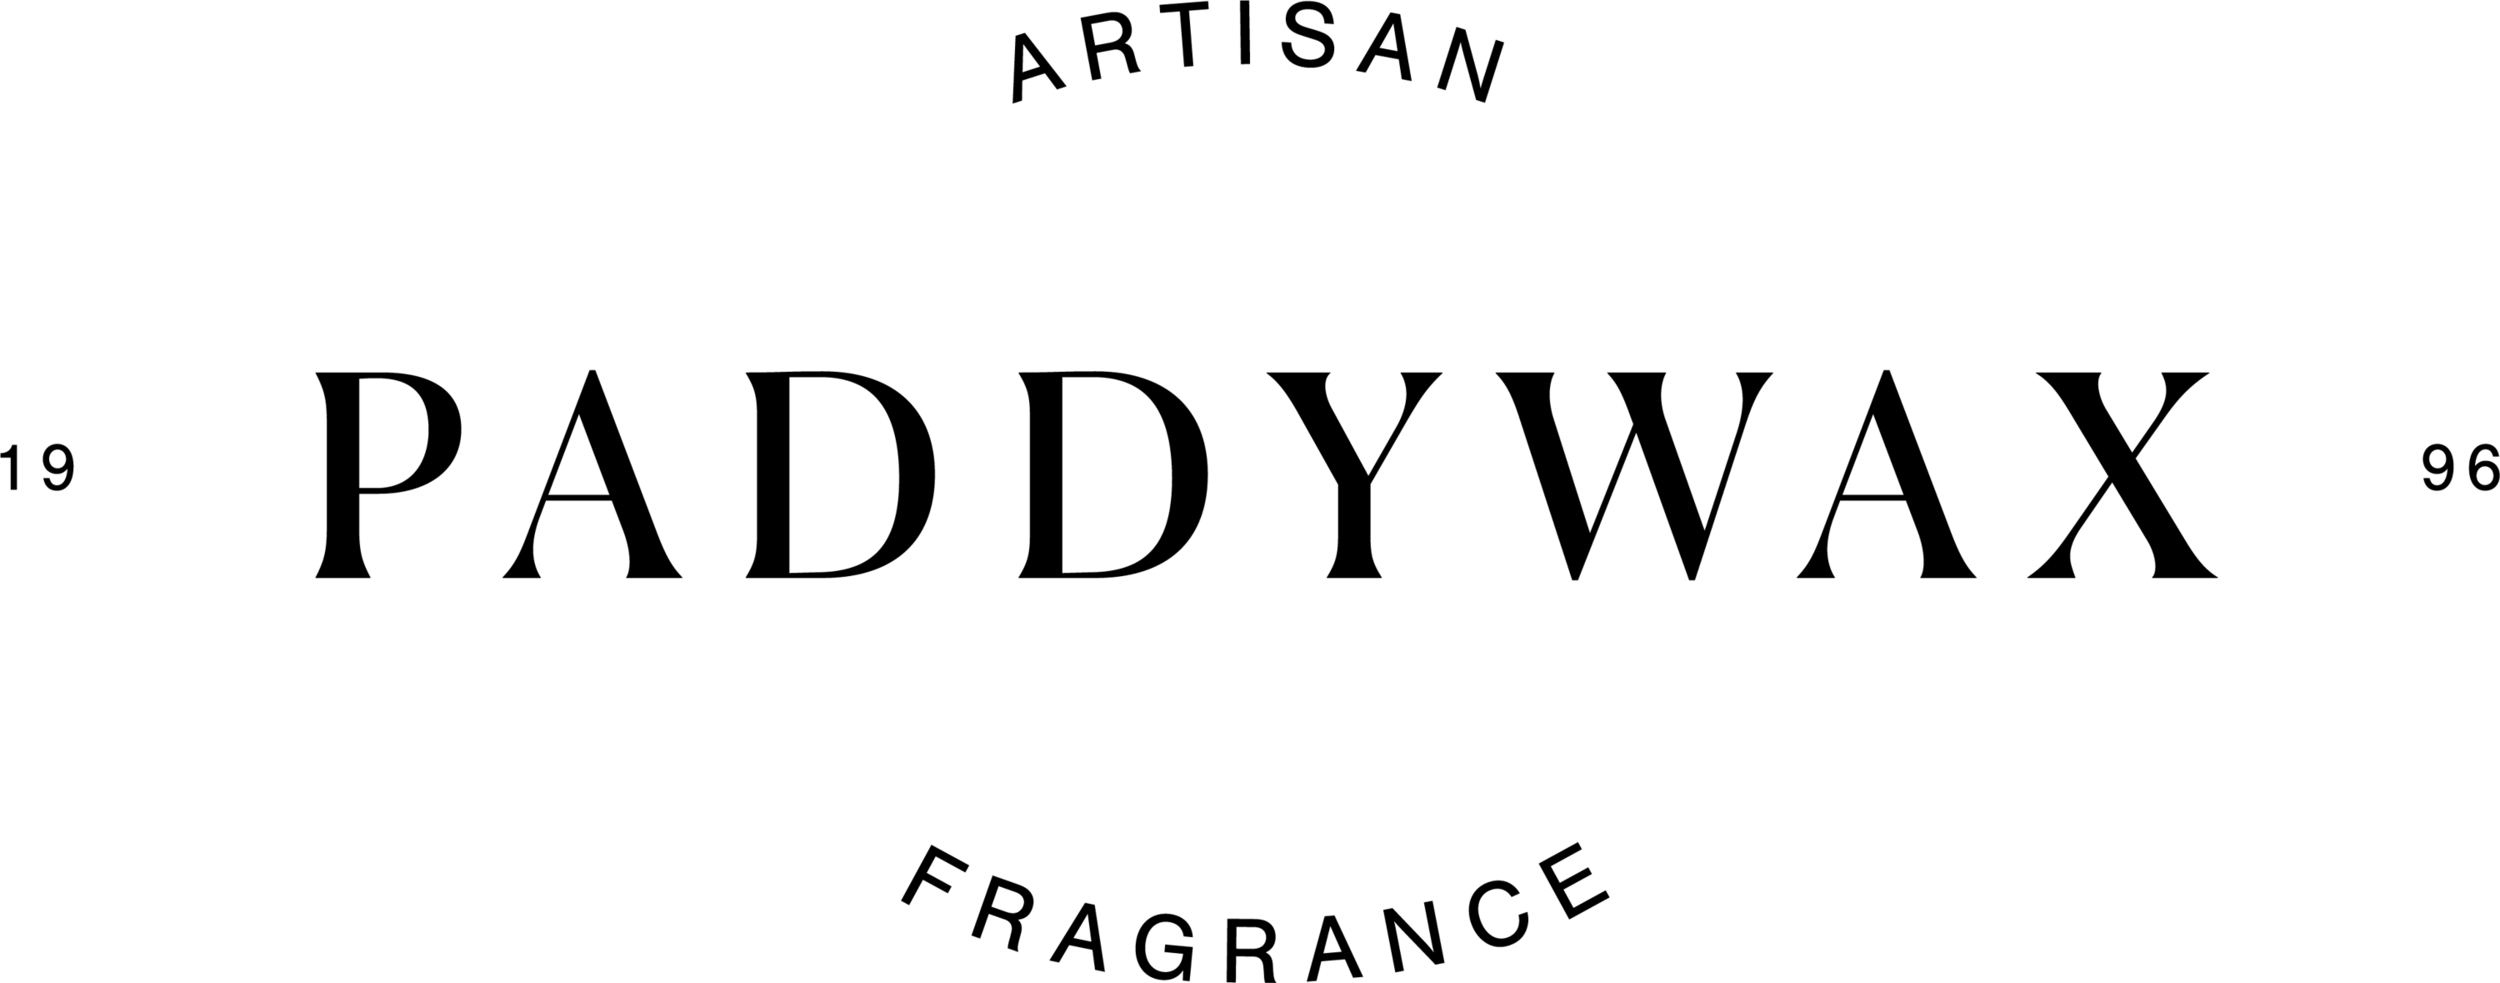 paddy logo.png